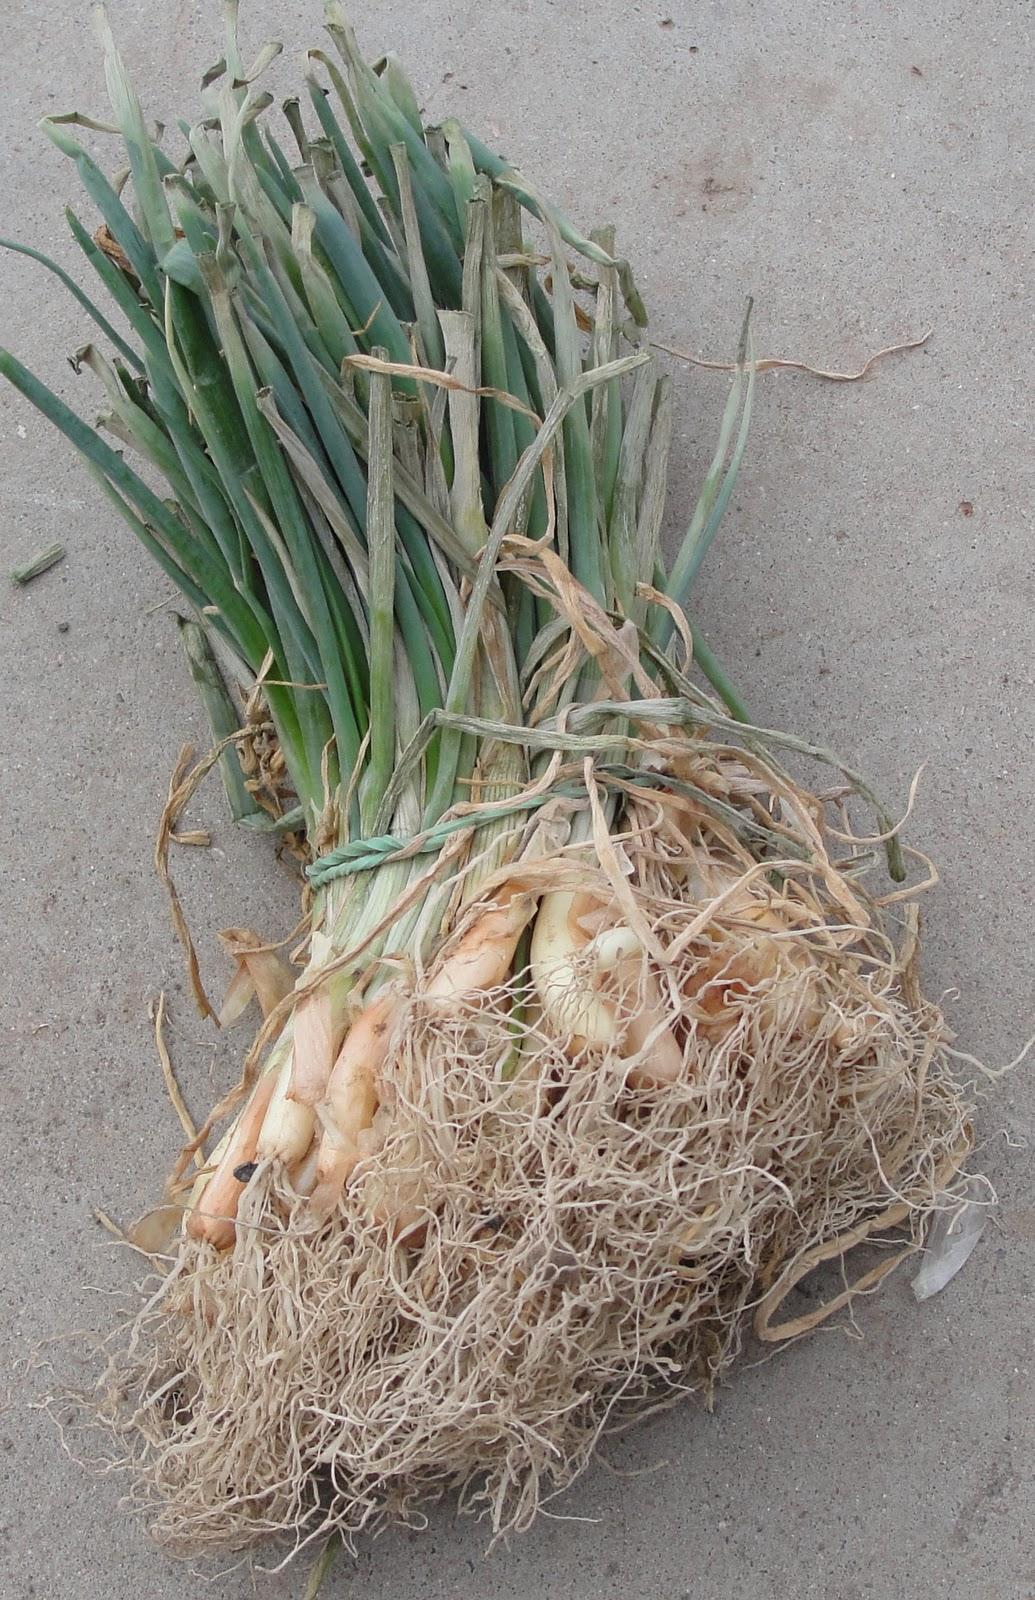 how to plant walla walla onion sets